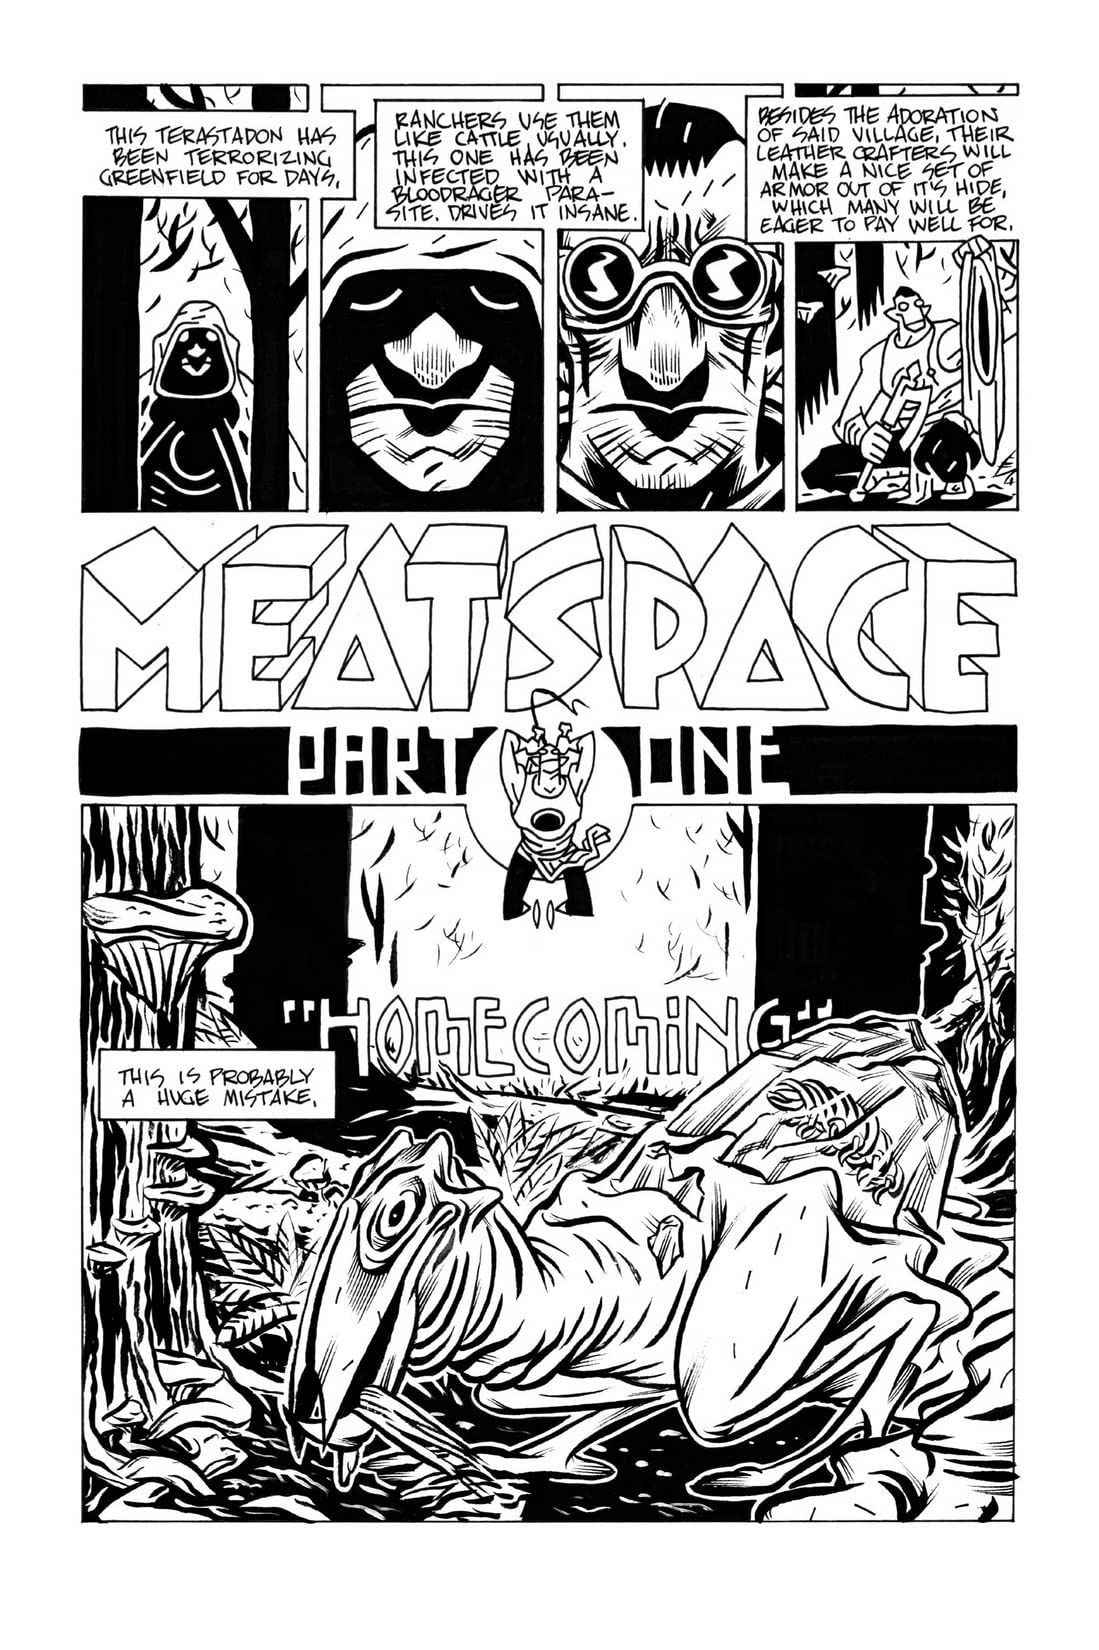 Meatspace #1